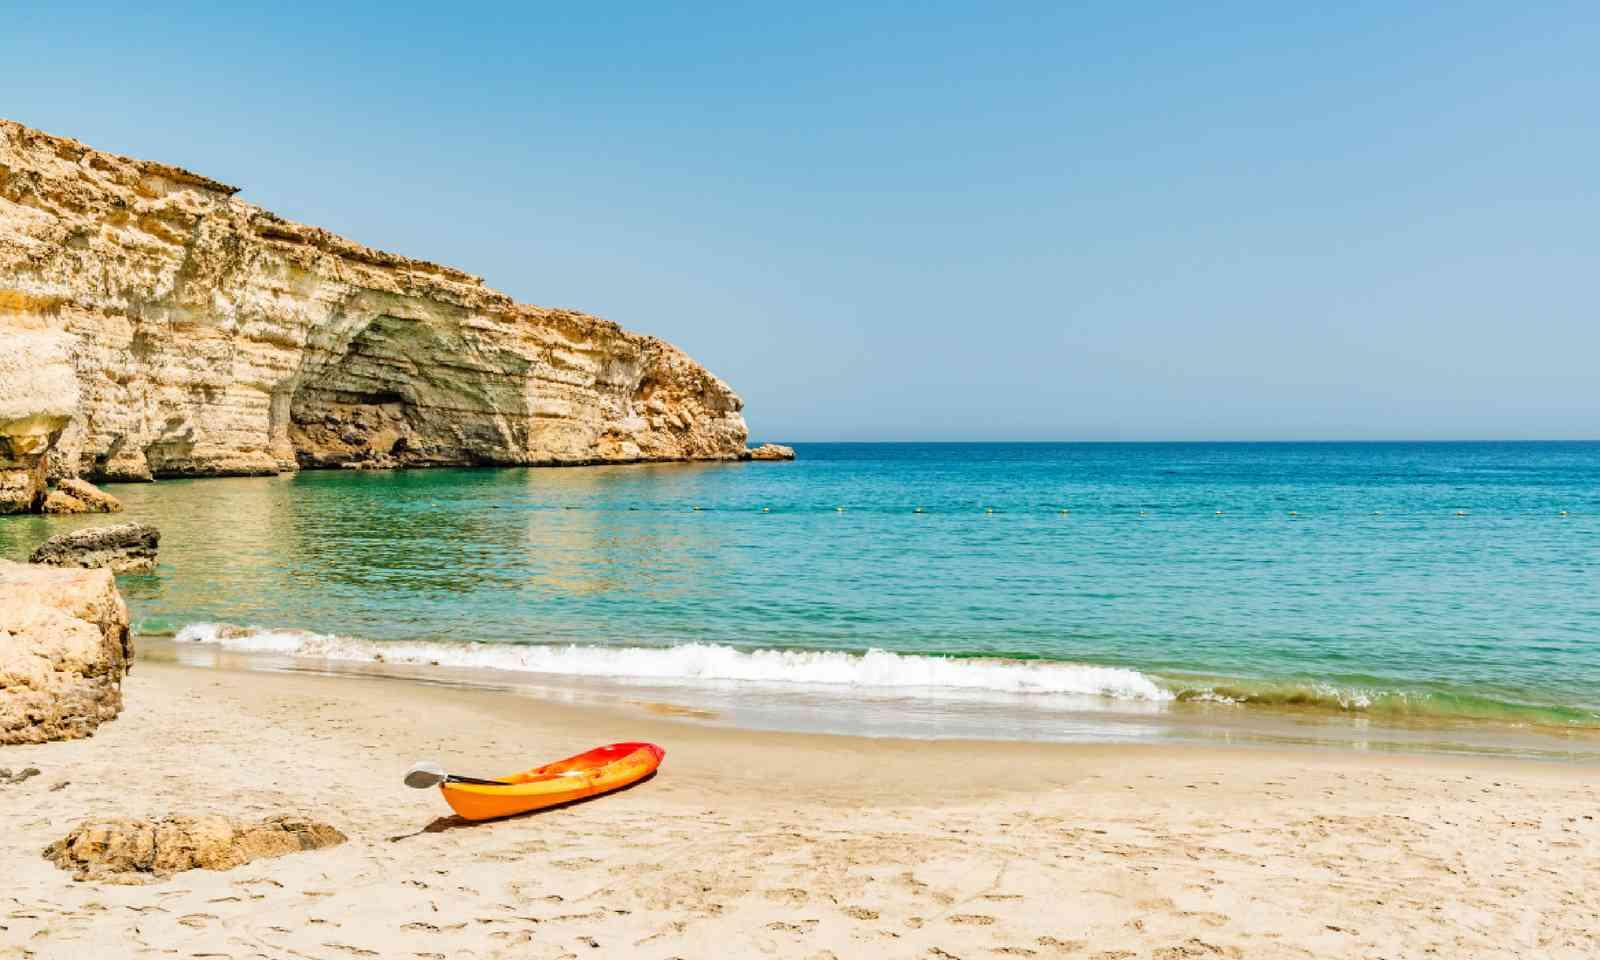 Beach at Barr Al Jissah in Oman (Shutterstock)